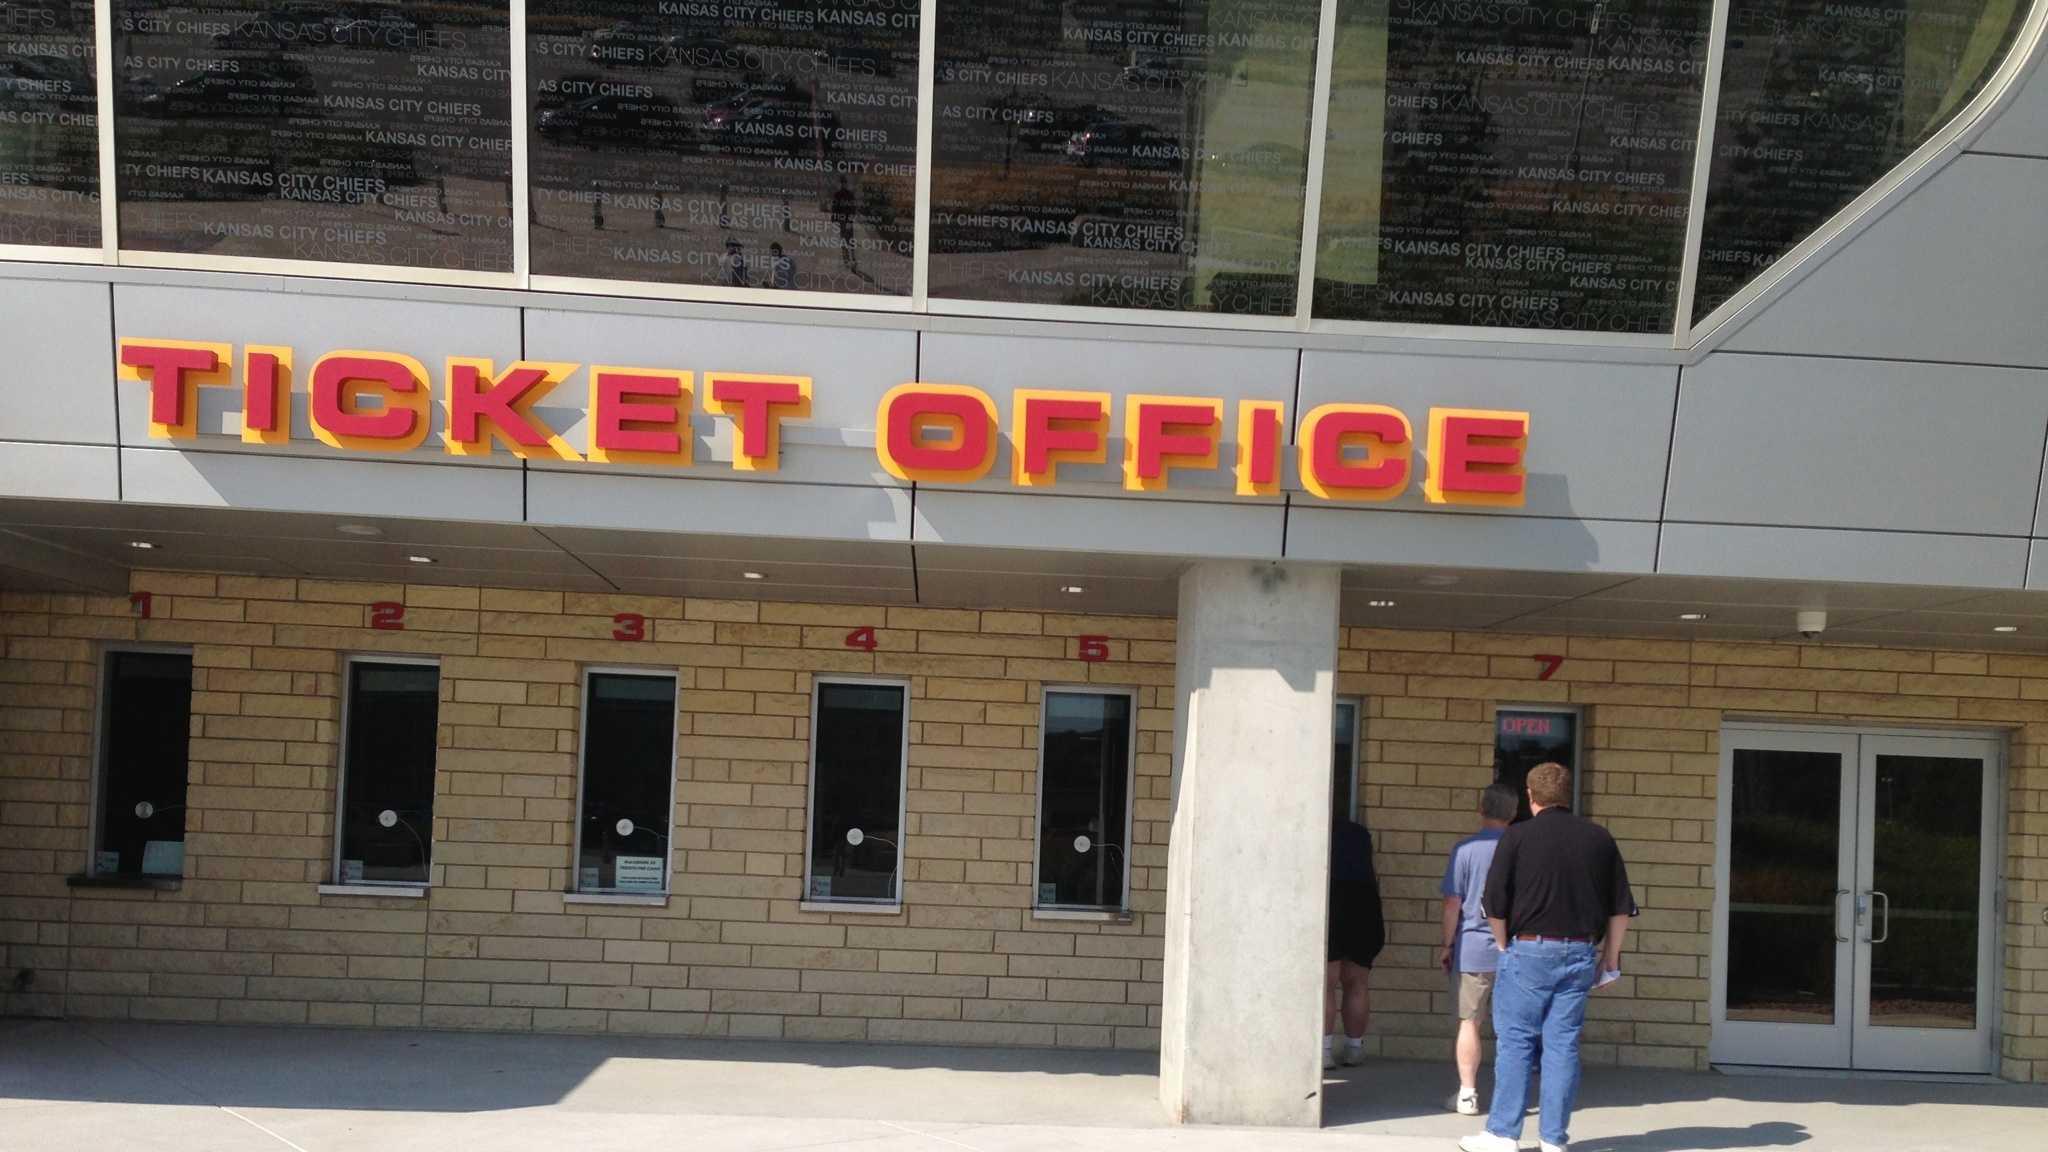 Chiefs Tickets on sale at Arrowhead Stadium